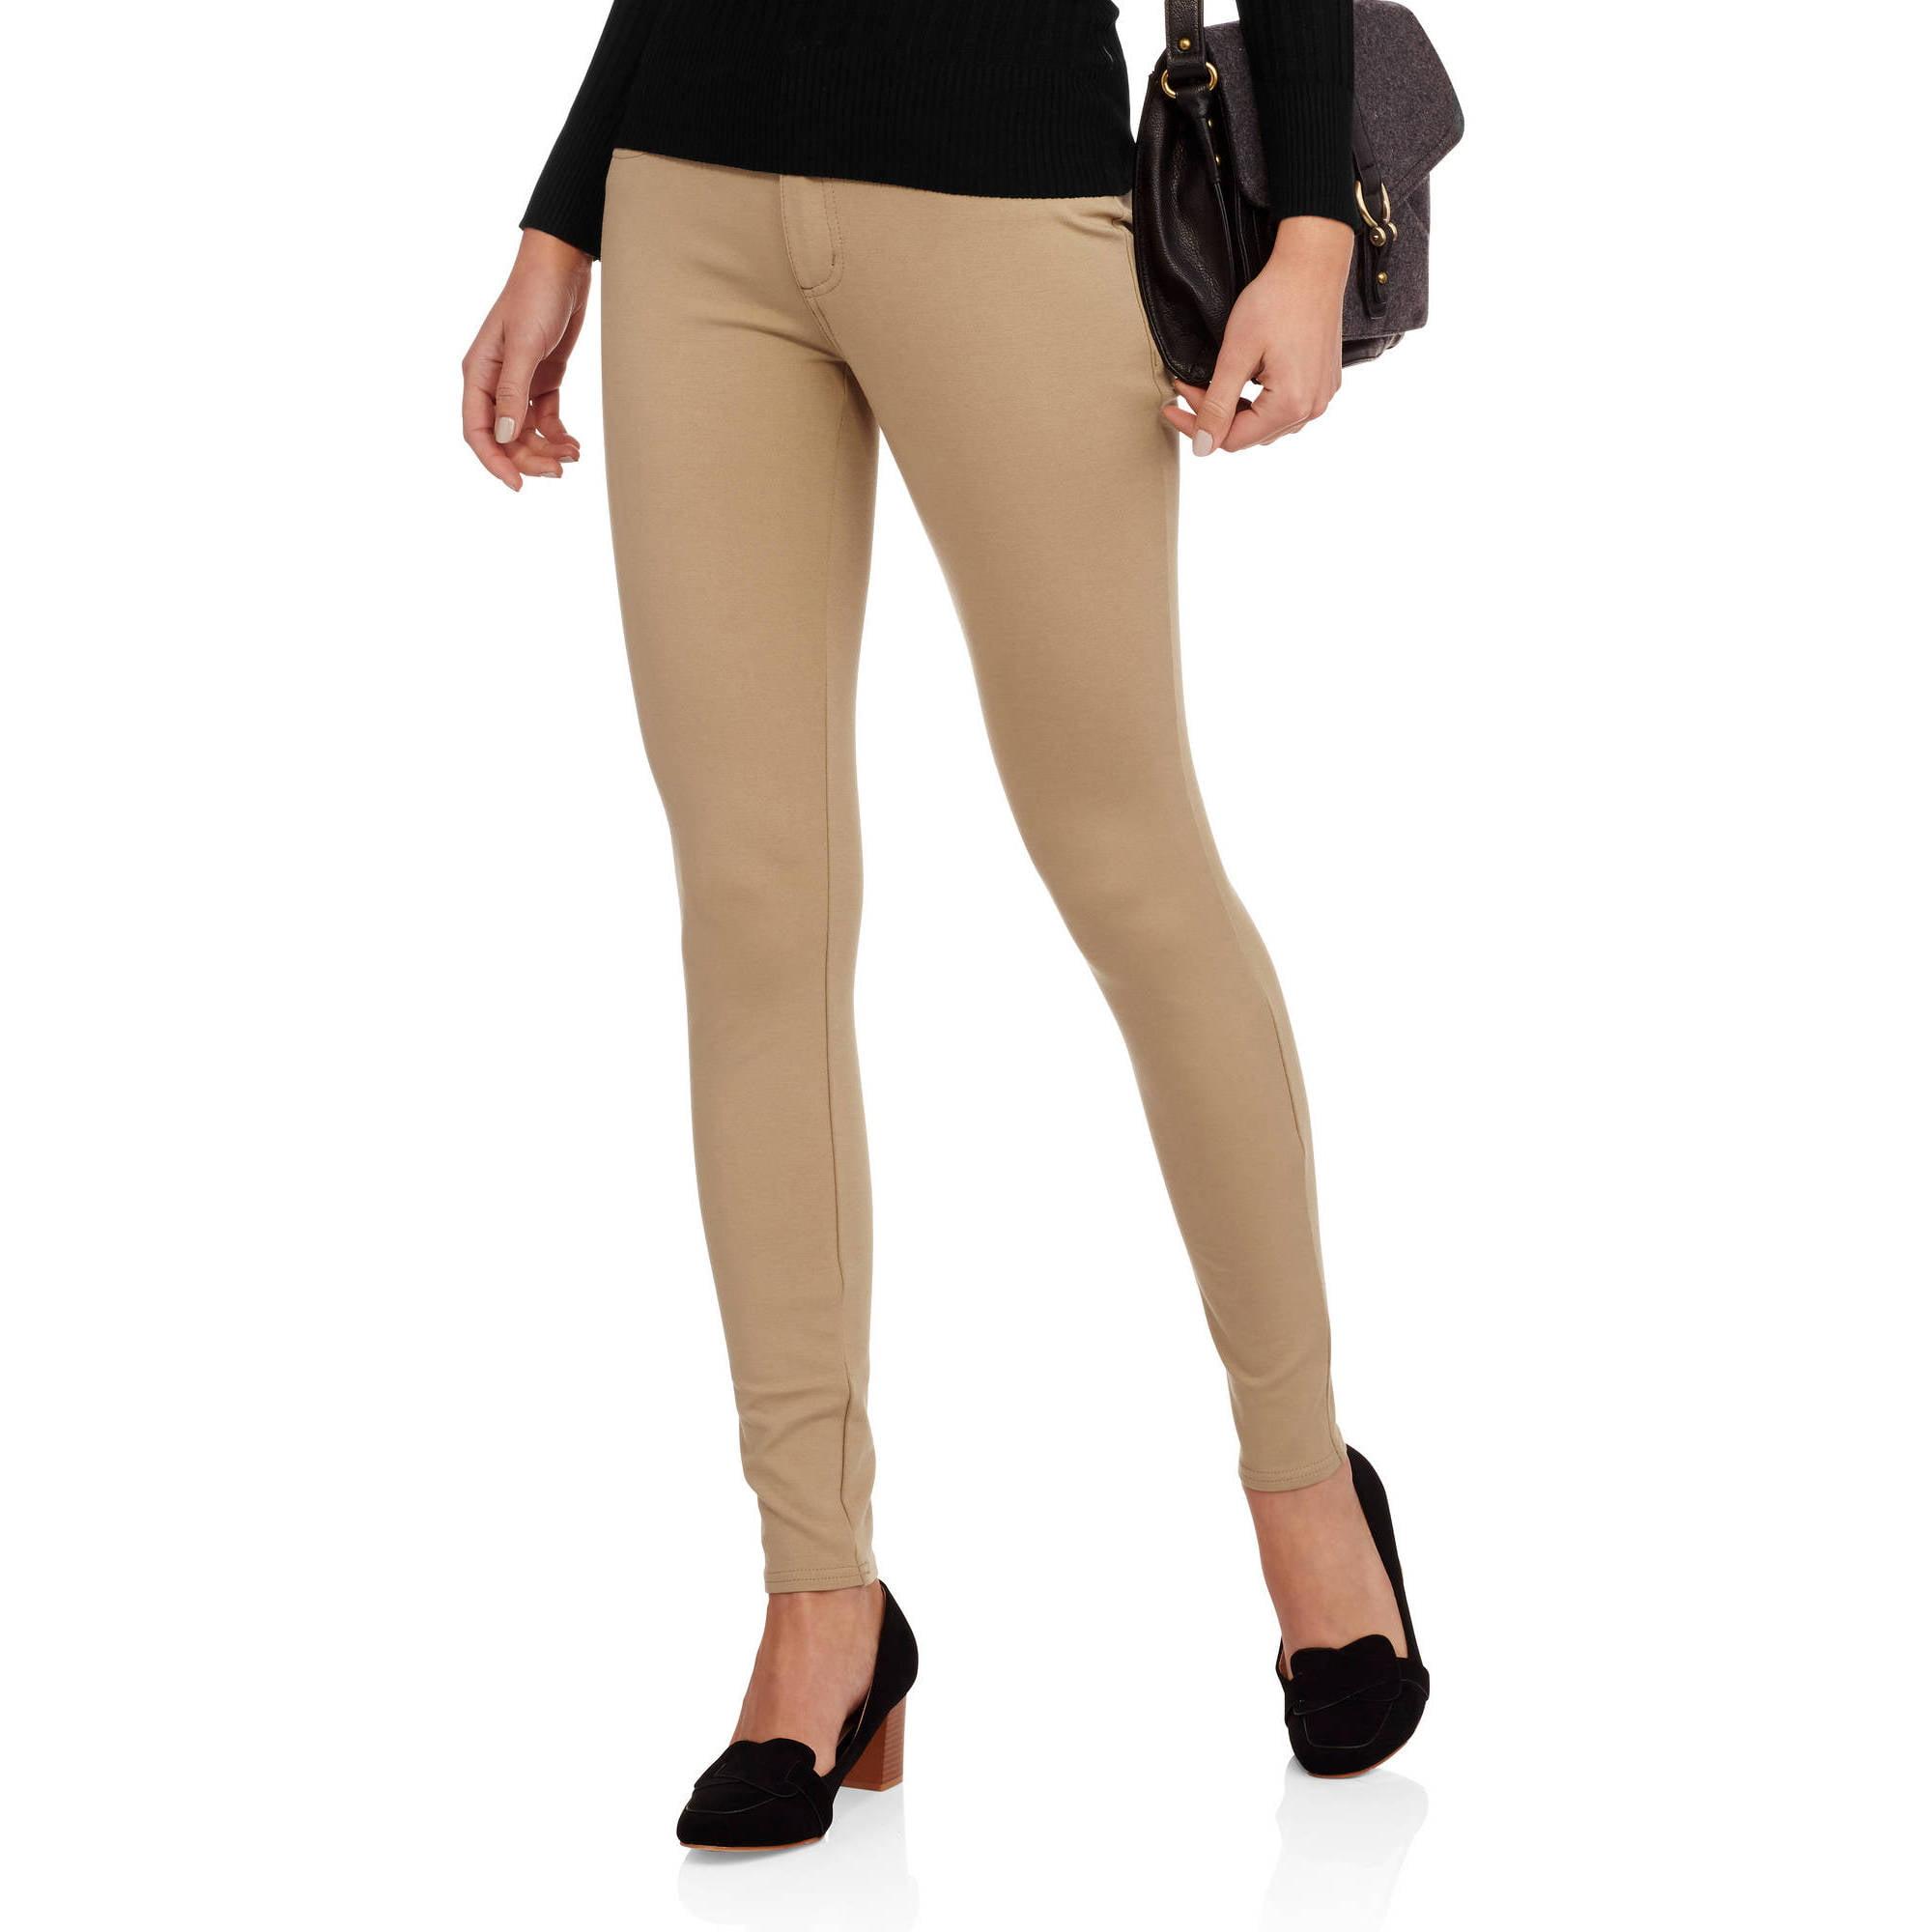 Faded Glory  Women's Skinny Ponte Pant